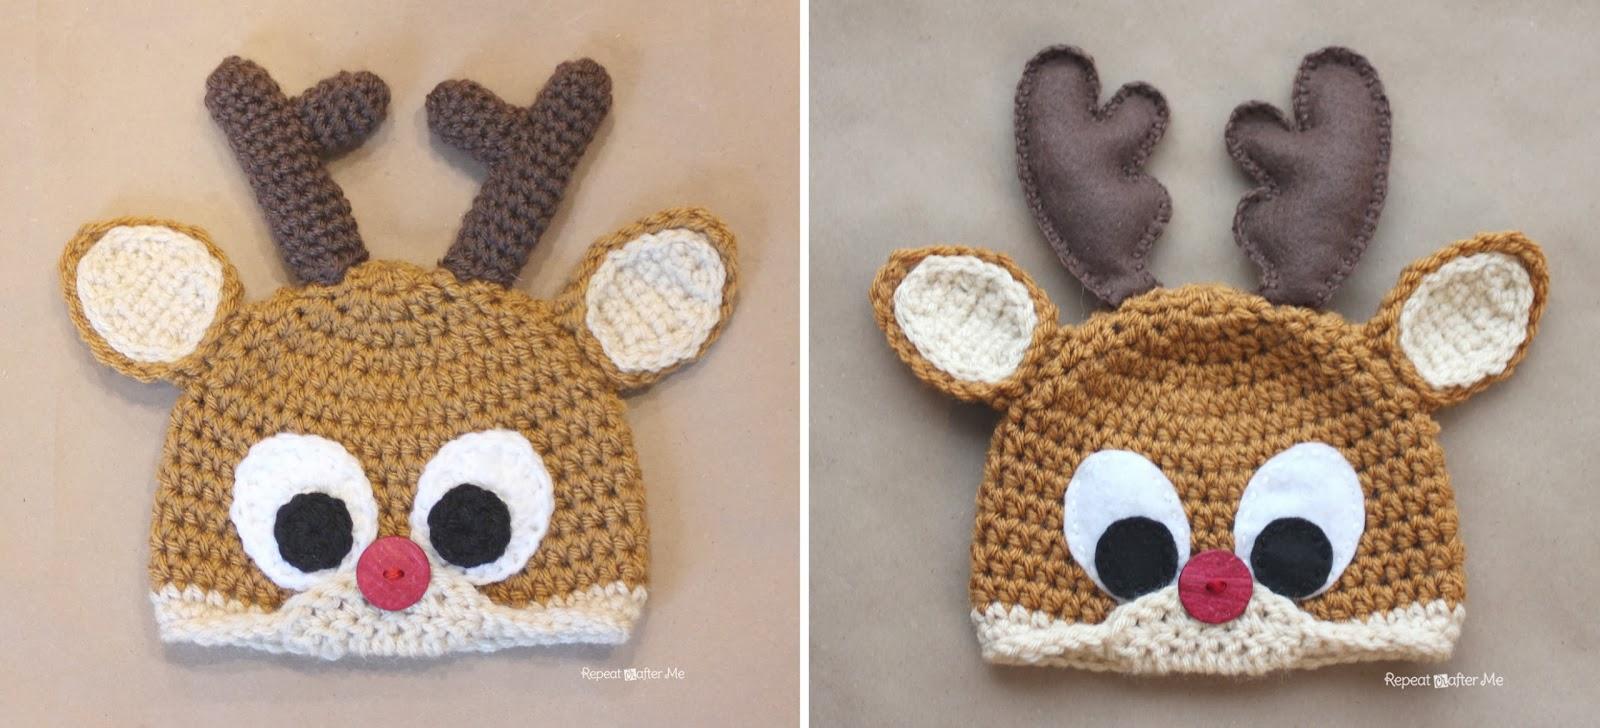 Crochet Reindeer Antlers Pattern - Repeat Crafter Me ffbc7d886cb